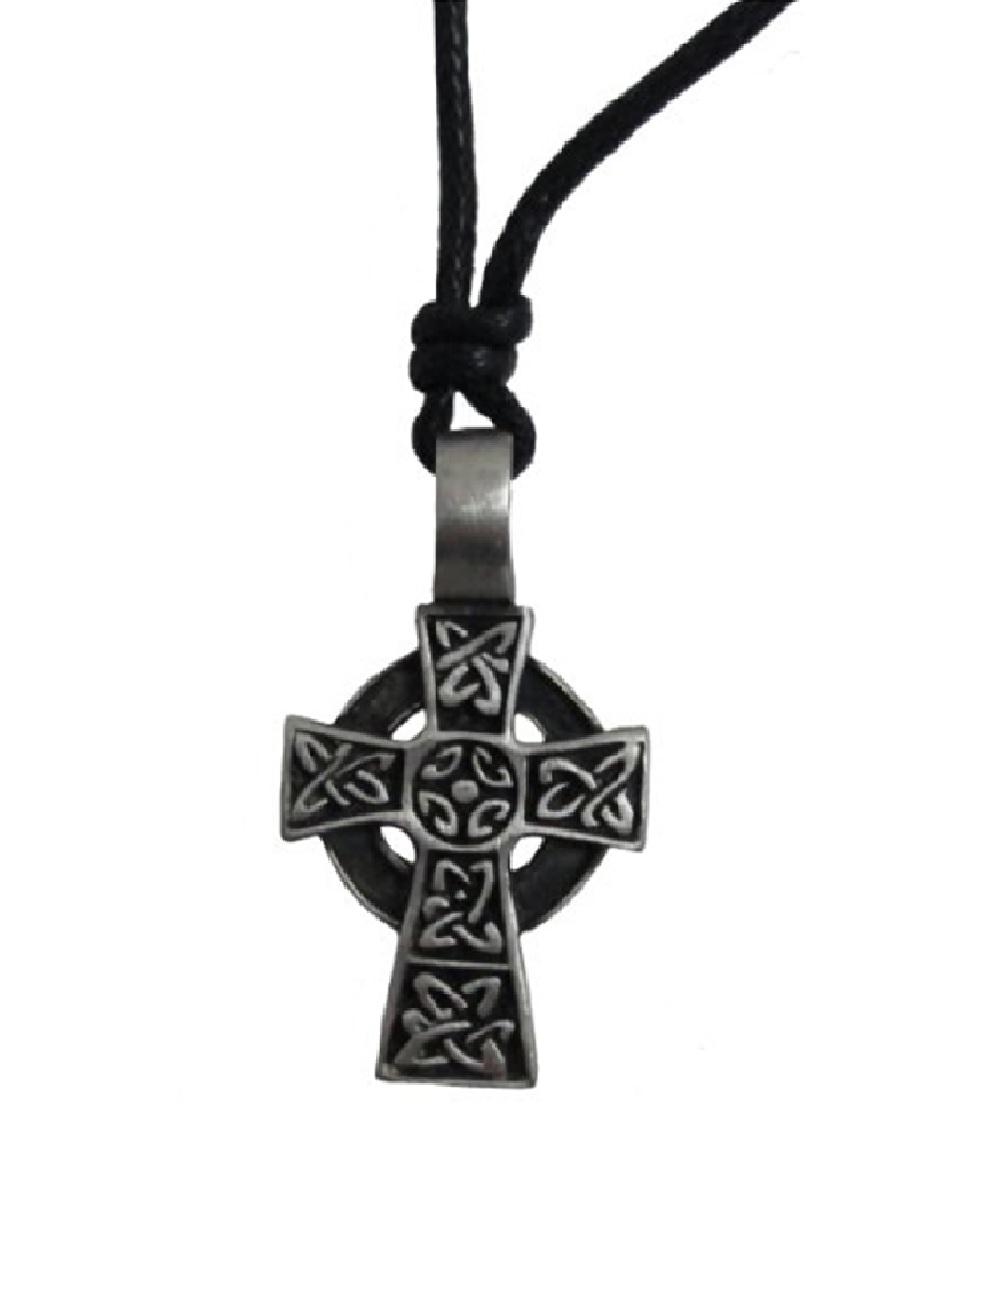 new celtic cross necklace small pewter 34 adjustable. Black Bedroom Furniture Sets. Home Design Ideas